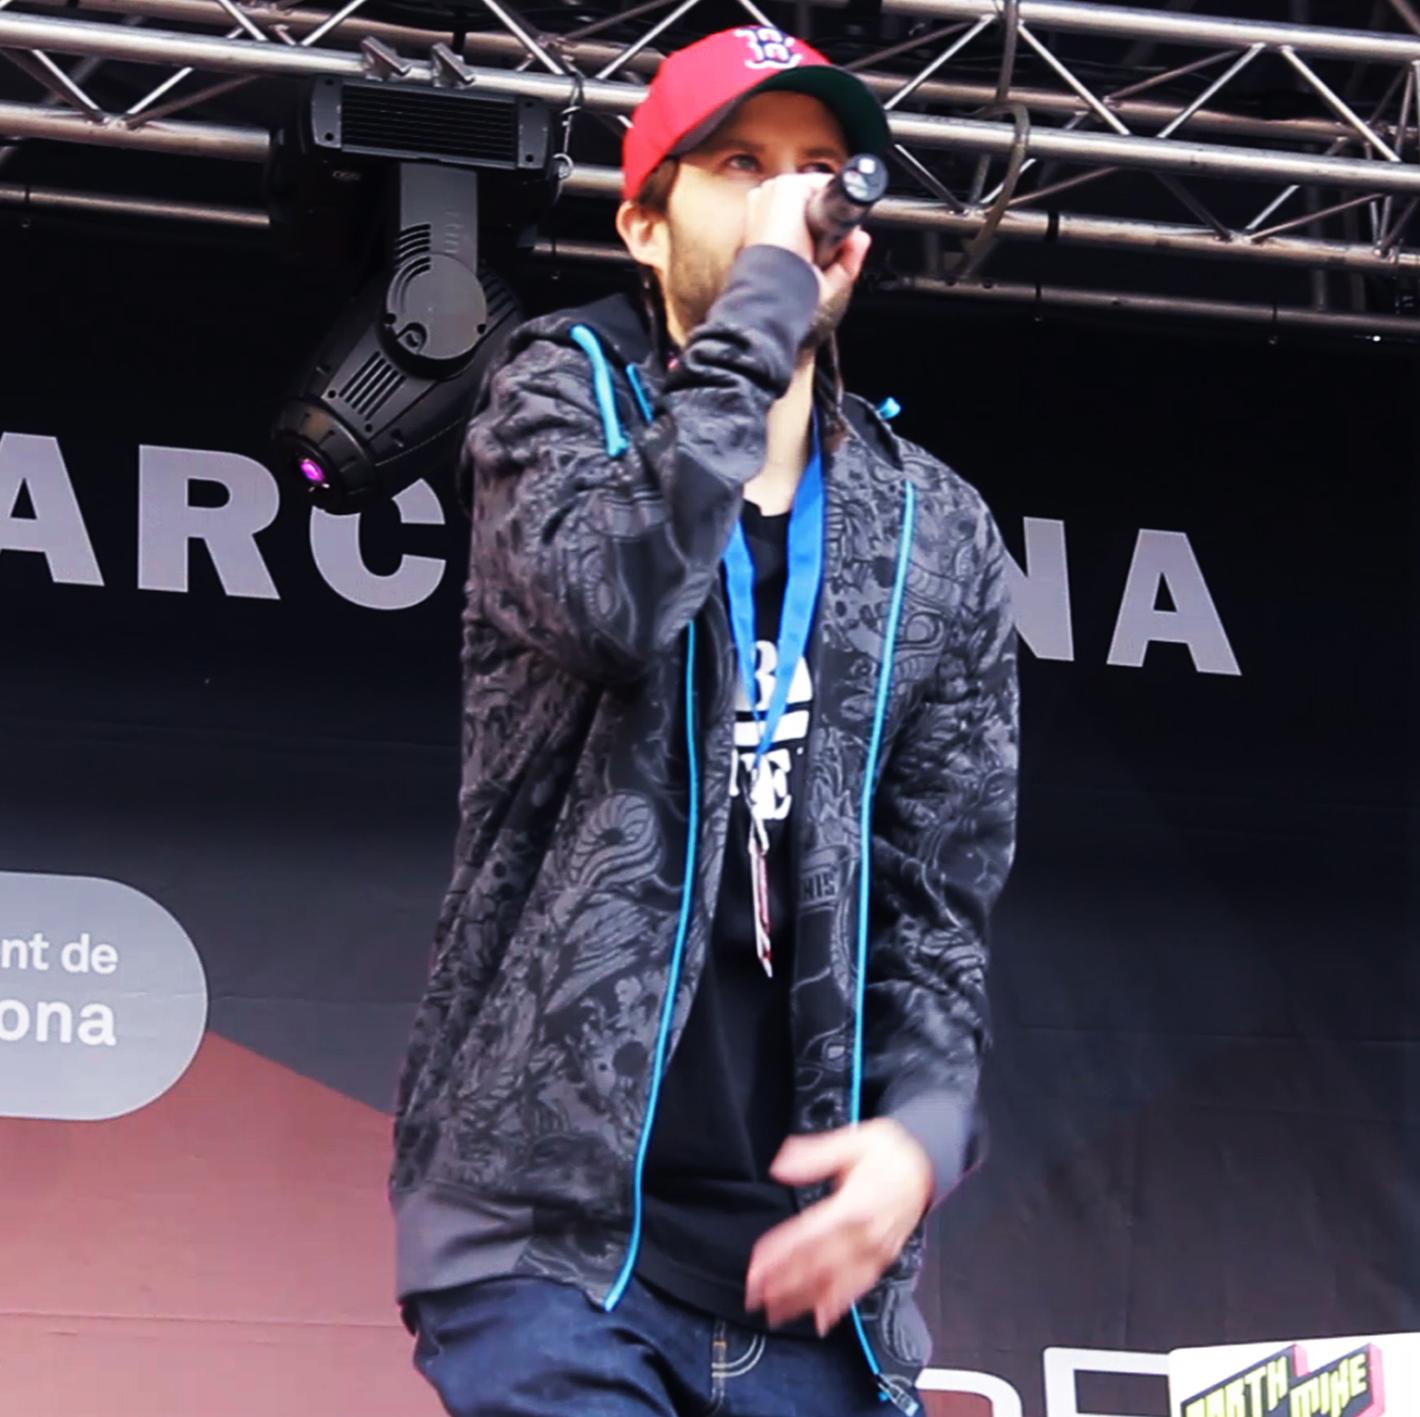 xgames barcelona festivales de rap skate